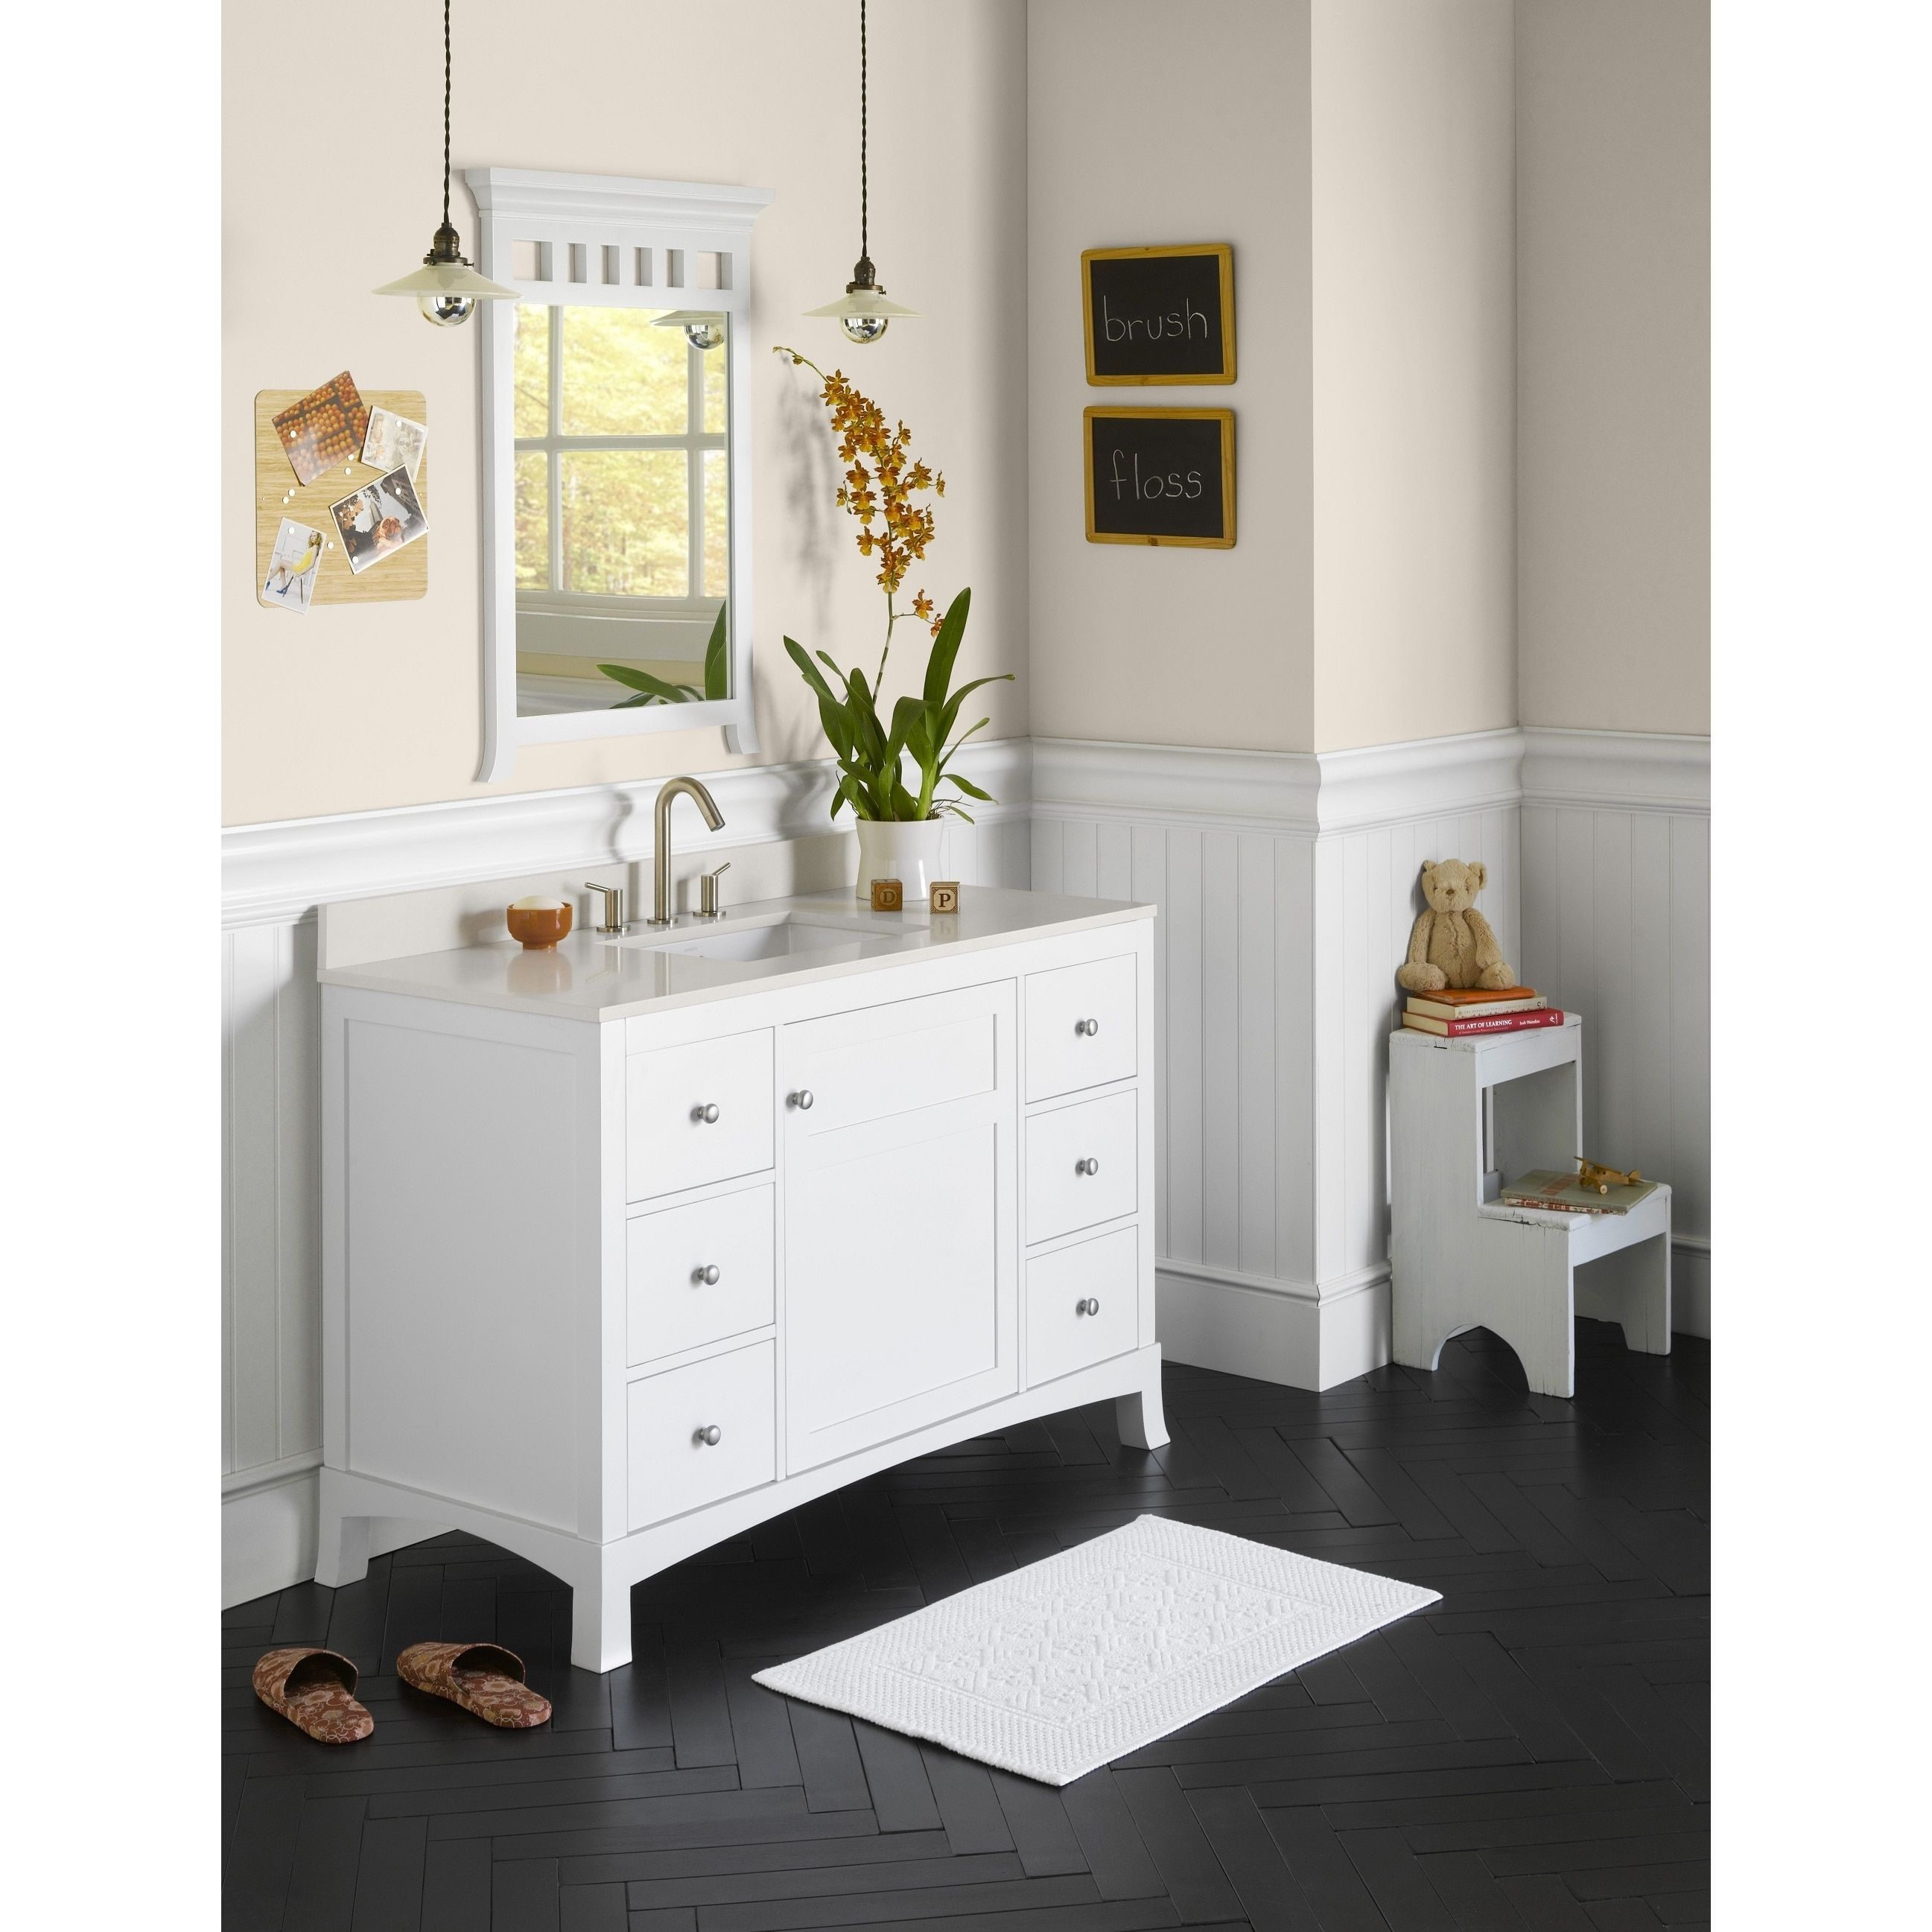 48 inch white bathroom vanity. Ronbow Hampton 48-inch Bathroom Vanity Set In White With Mirror, Quartz Countertop Ceramic 48 Inch